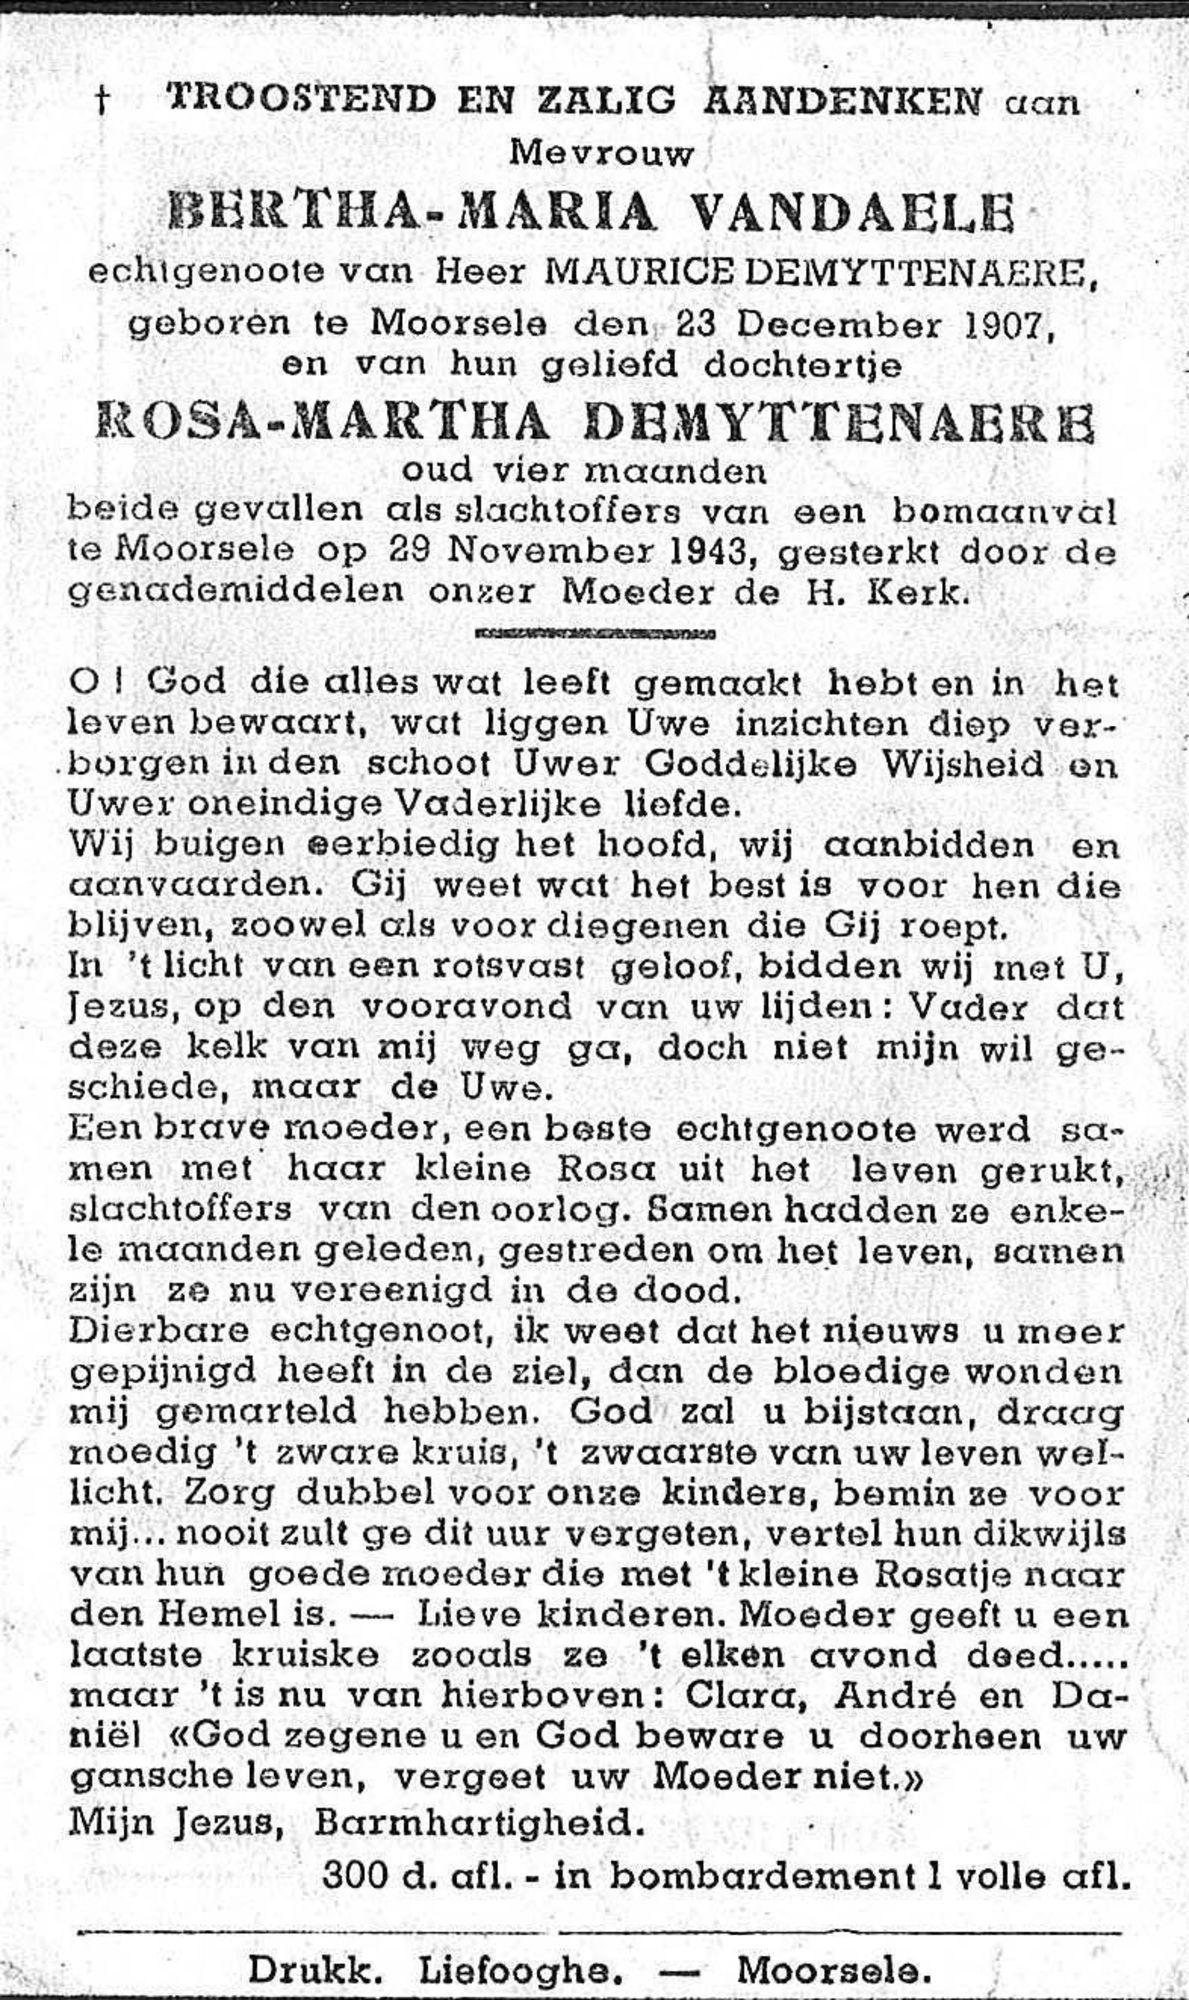 Bertha-Maria Vandaele